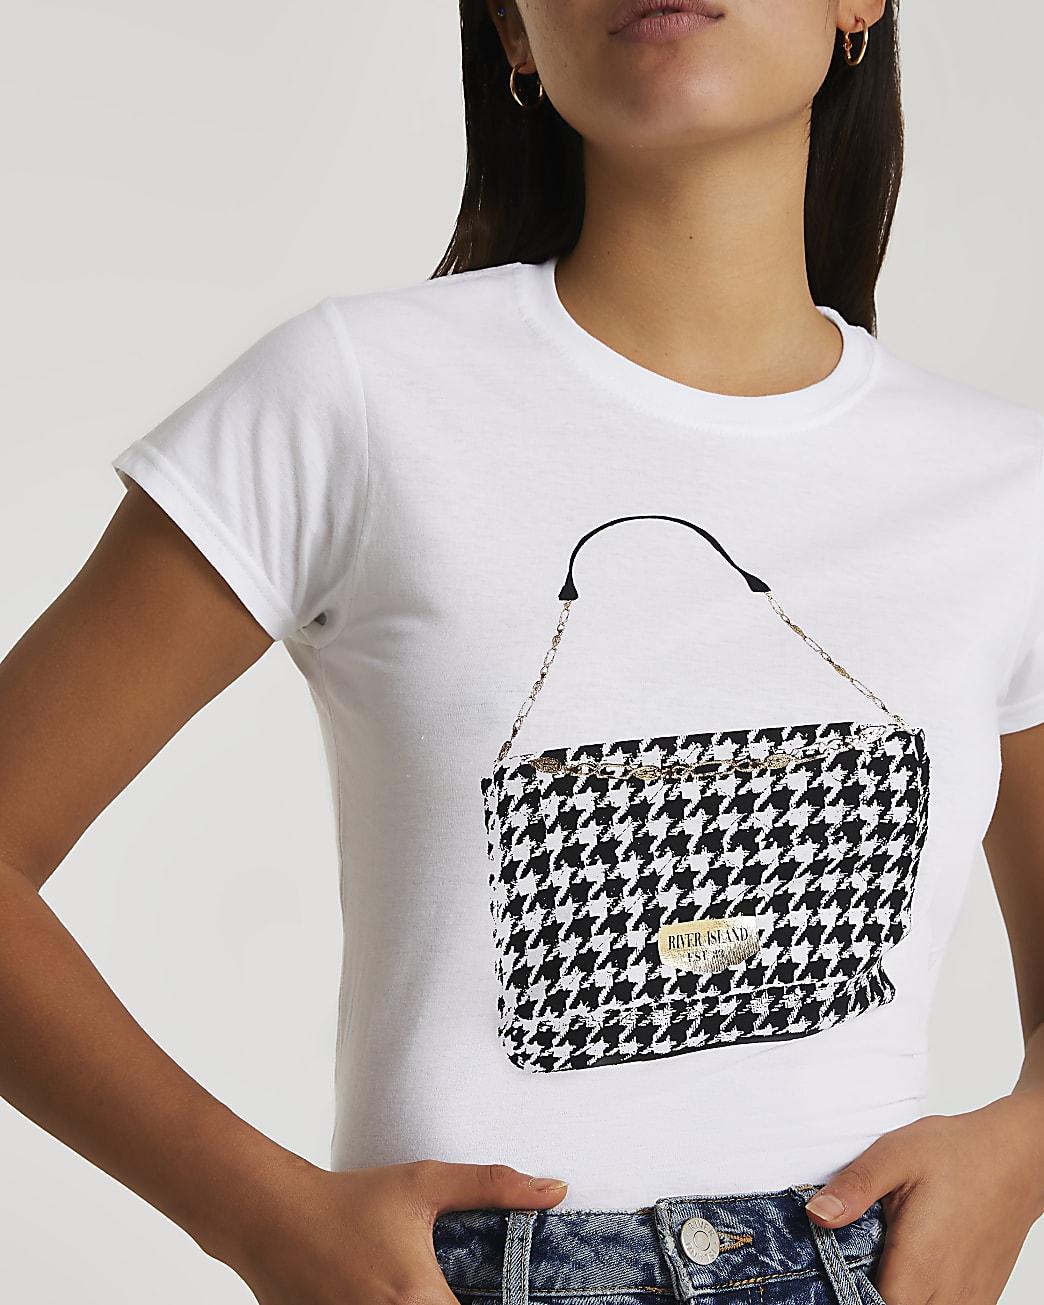 White dogtooth handbag print t-shirt